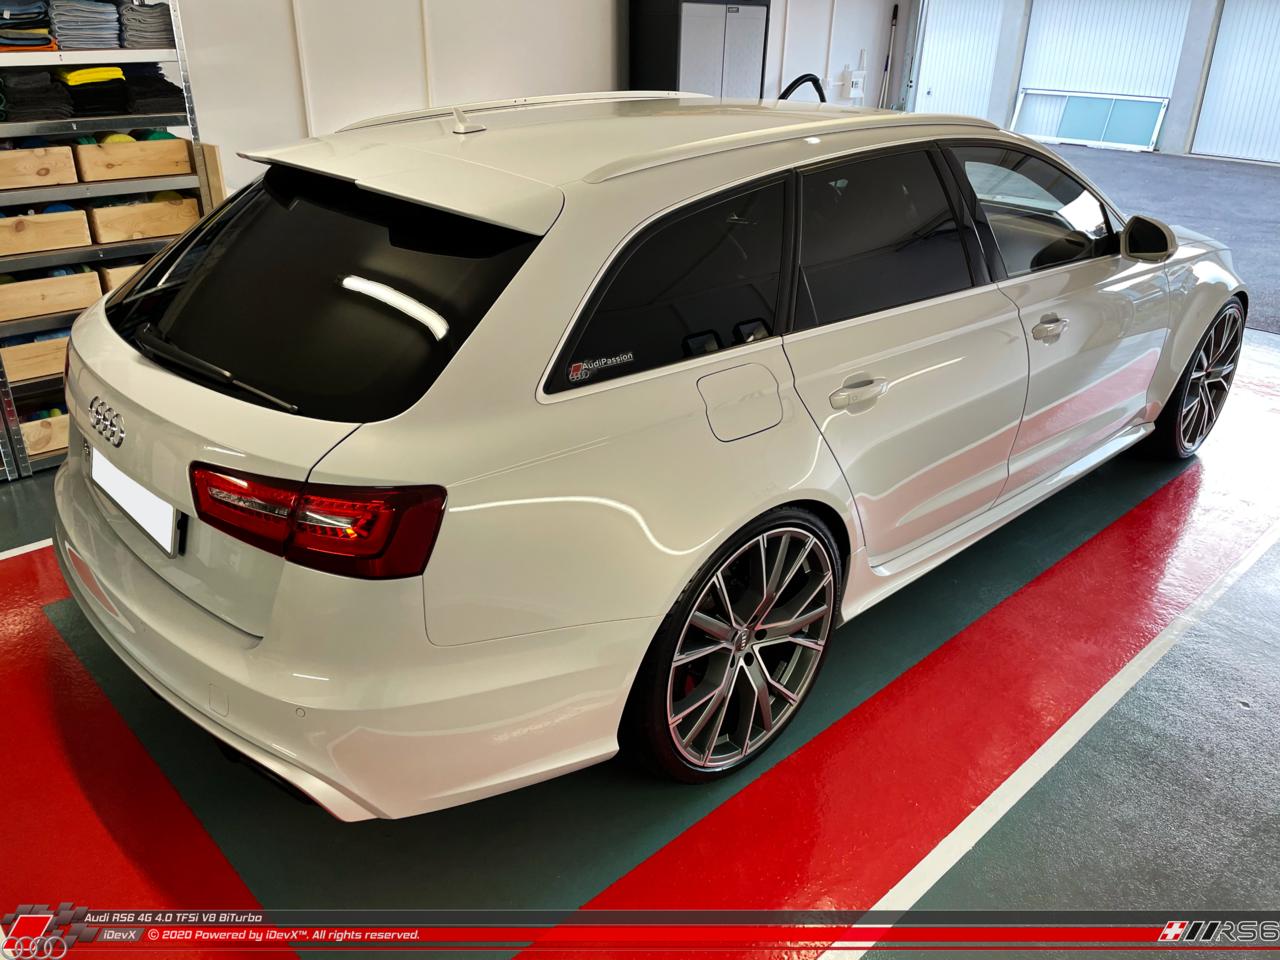 19.02.2021_Audi-RS6_iDevX_003.png